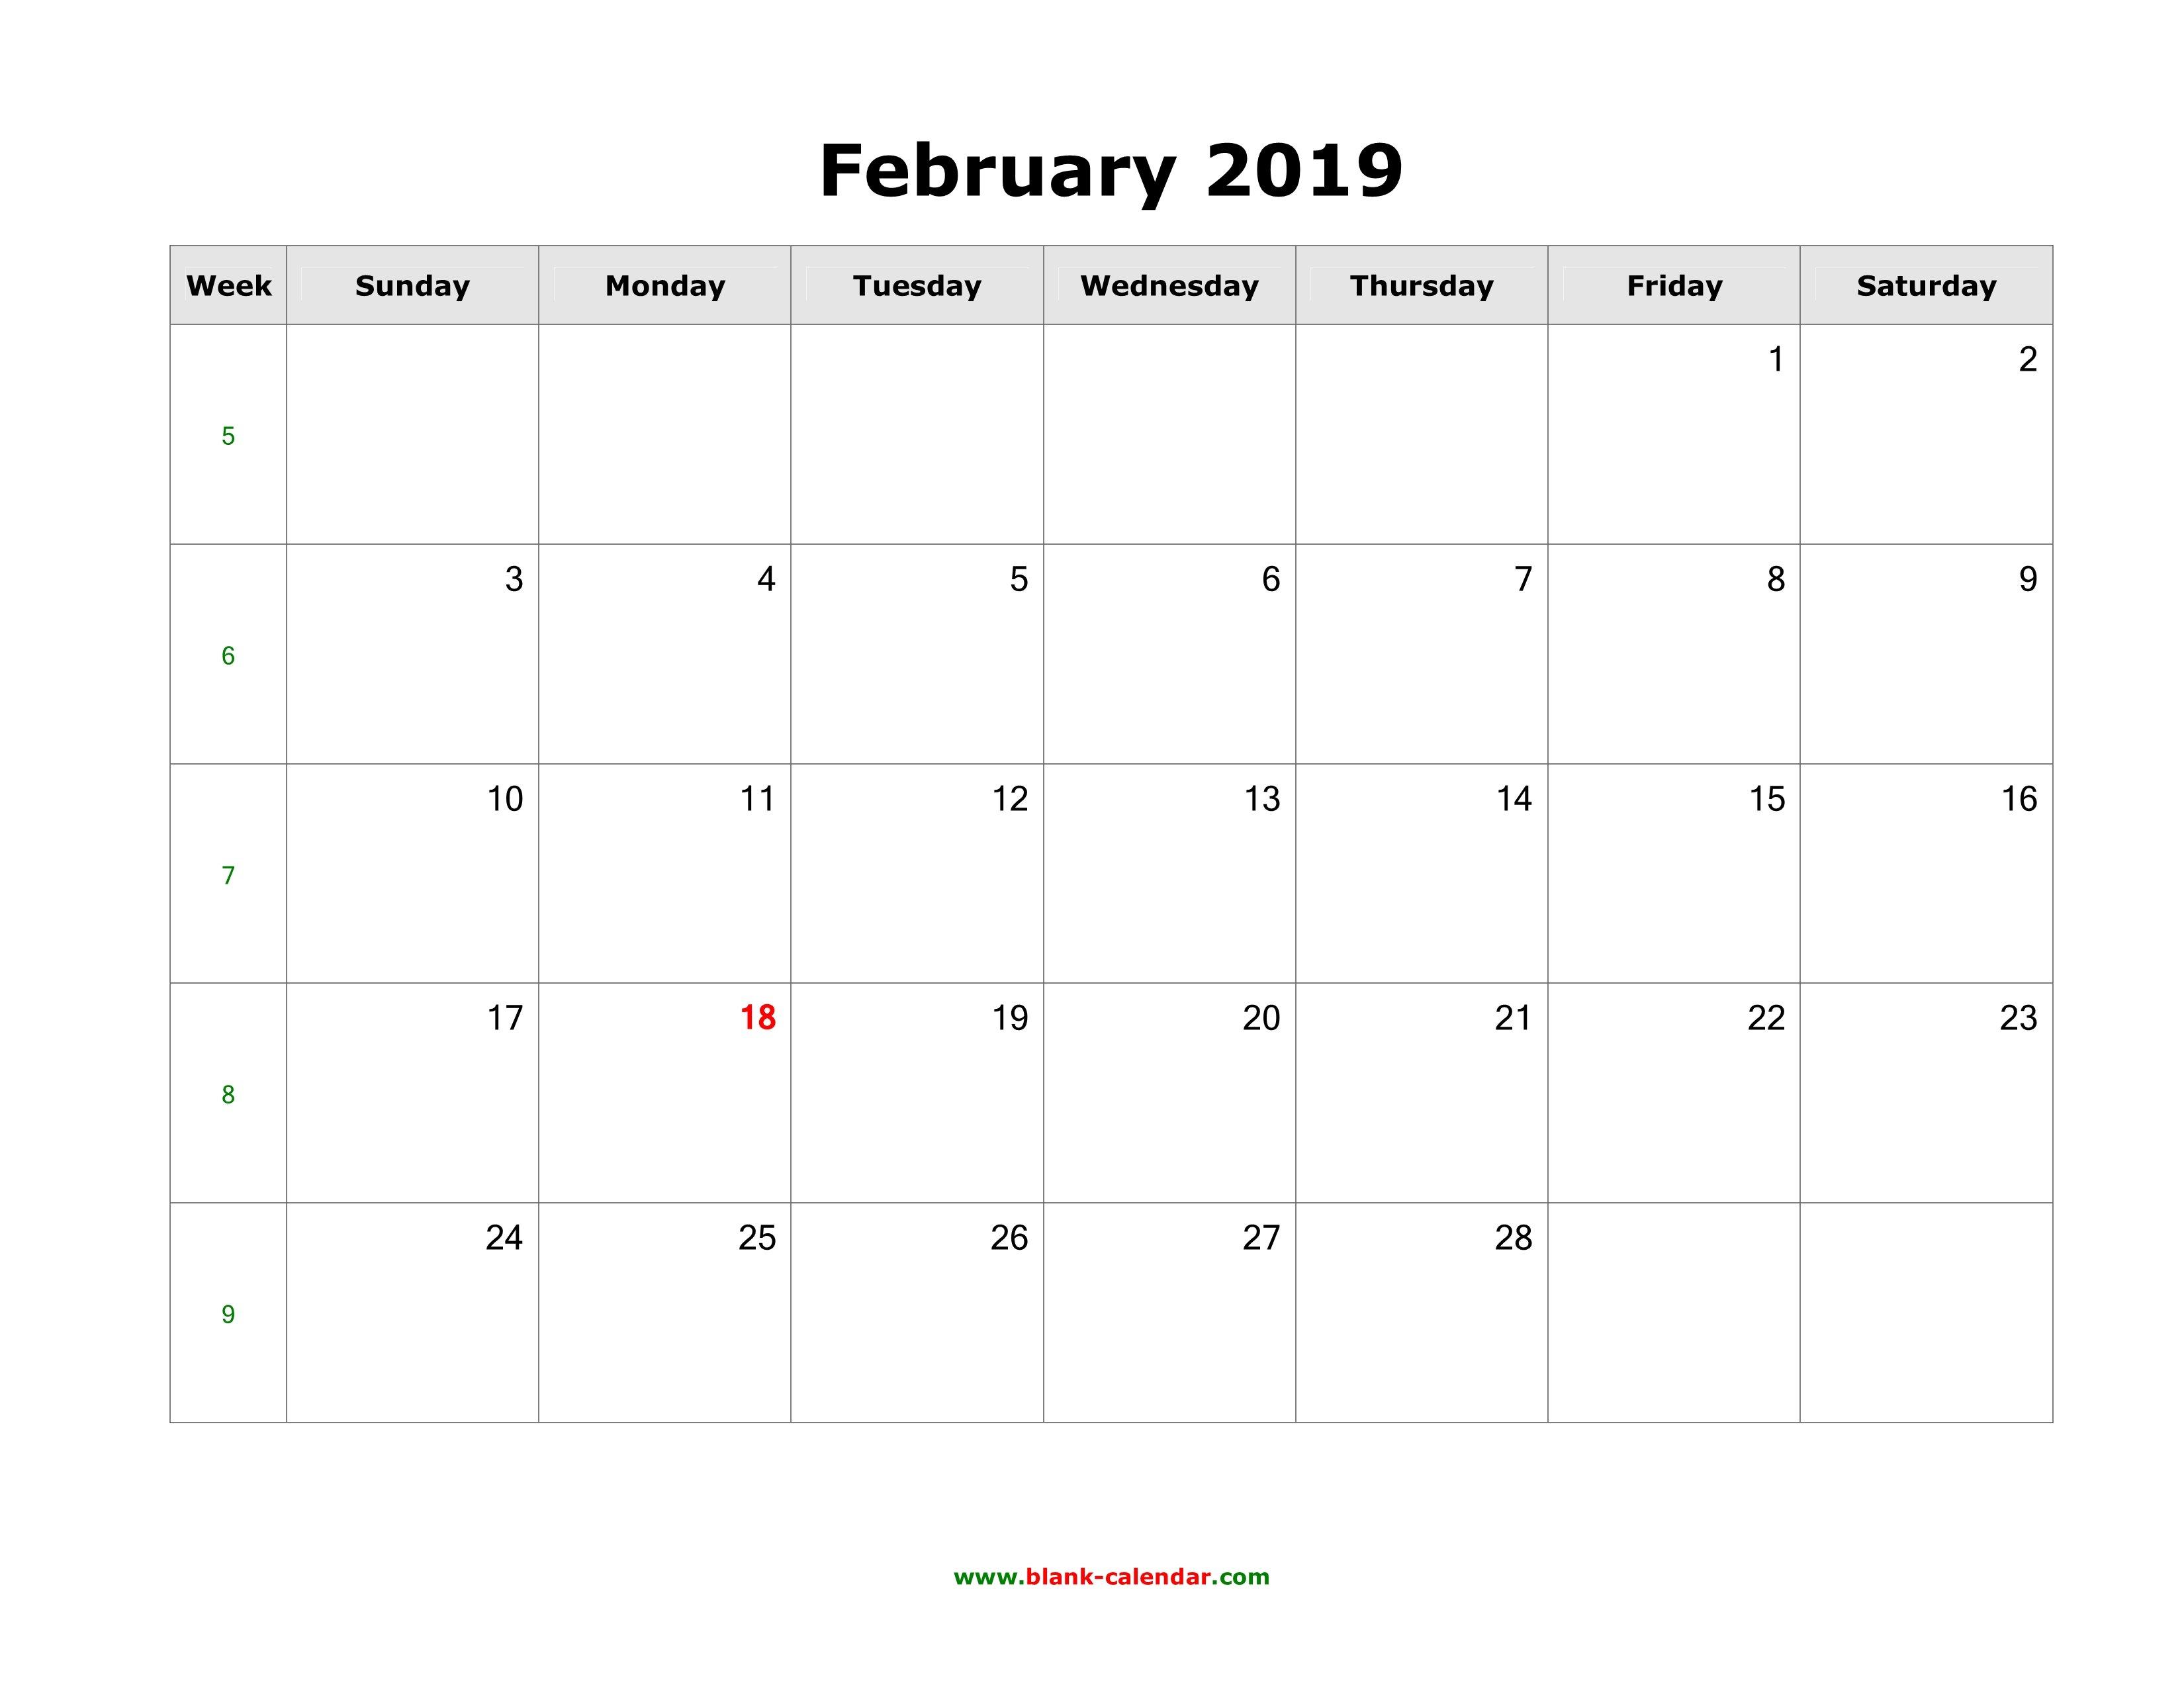 Download February 2019 Blank Calendar (Horizontal) Calendar Of 2019 February